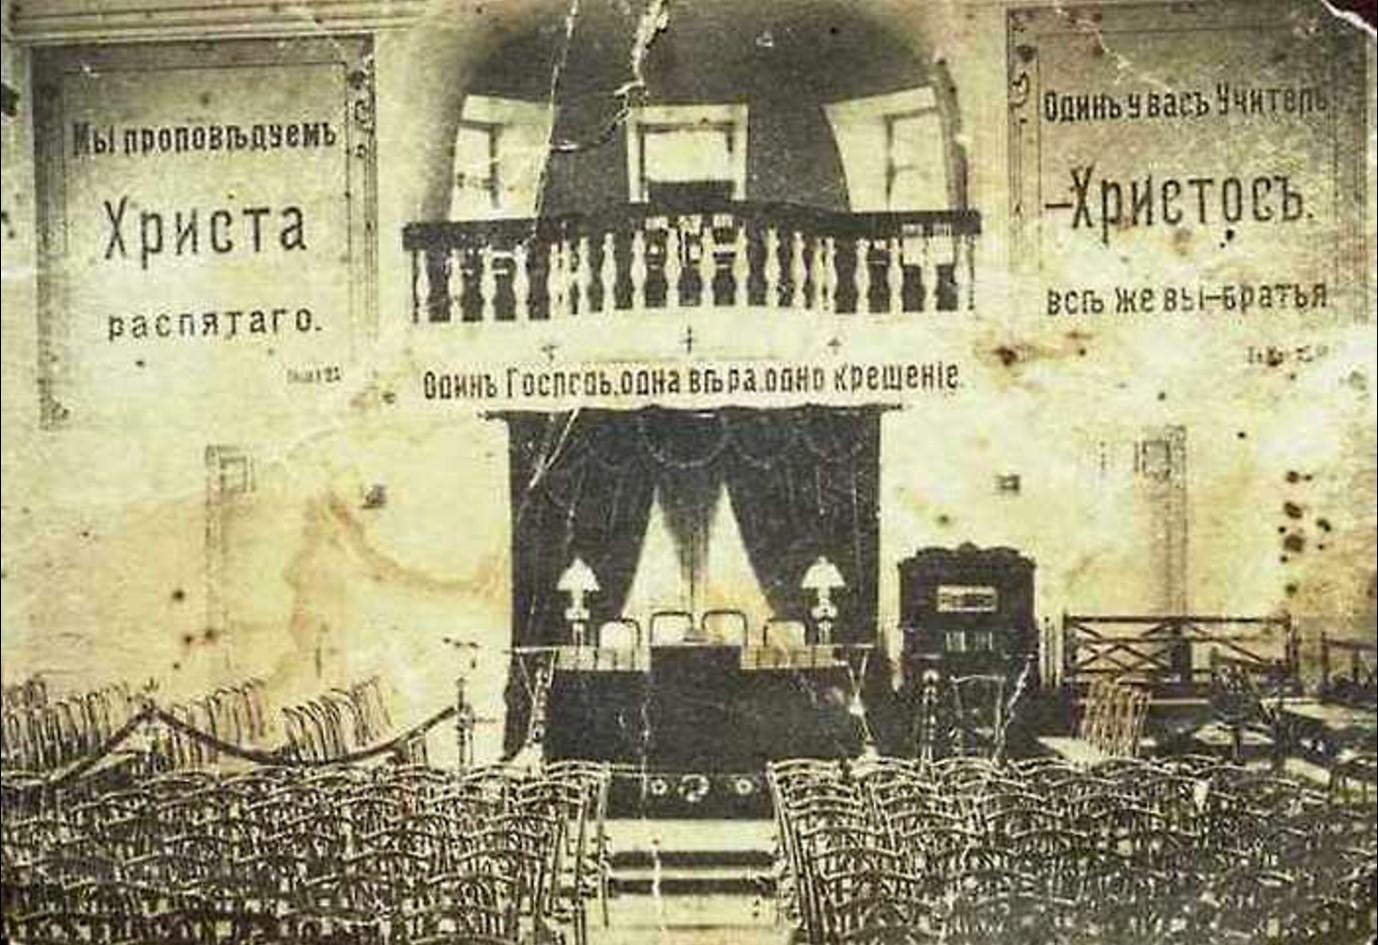 Молитвенный дом баптистов. Интерьер